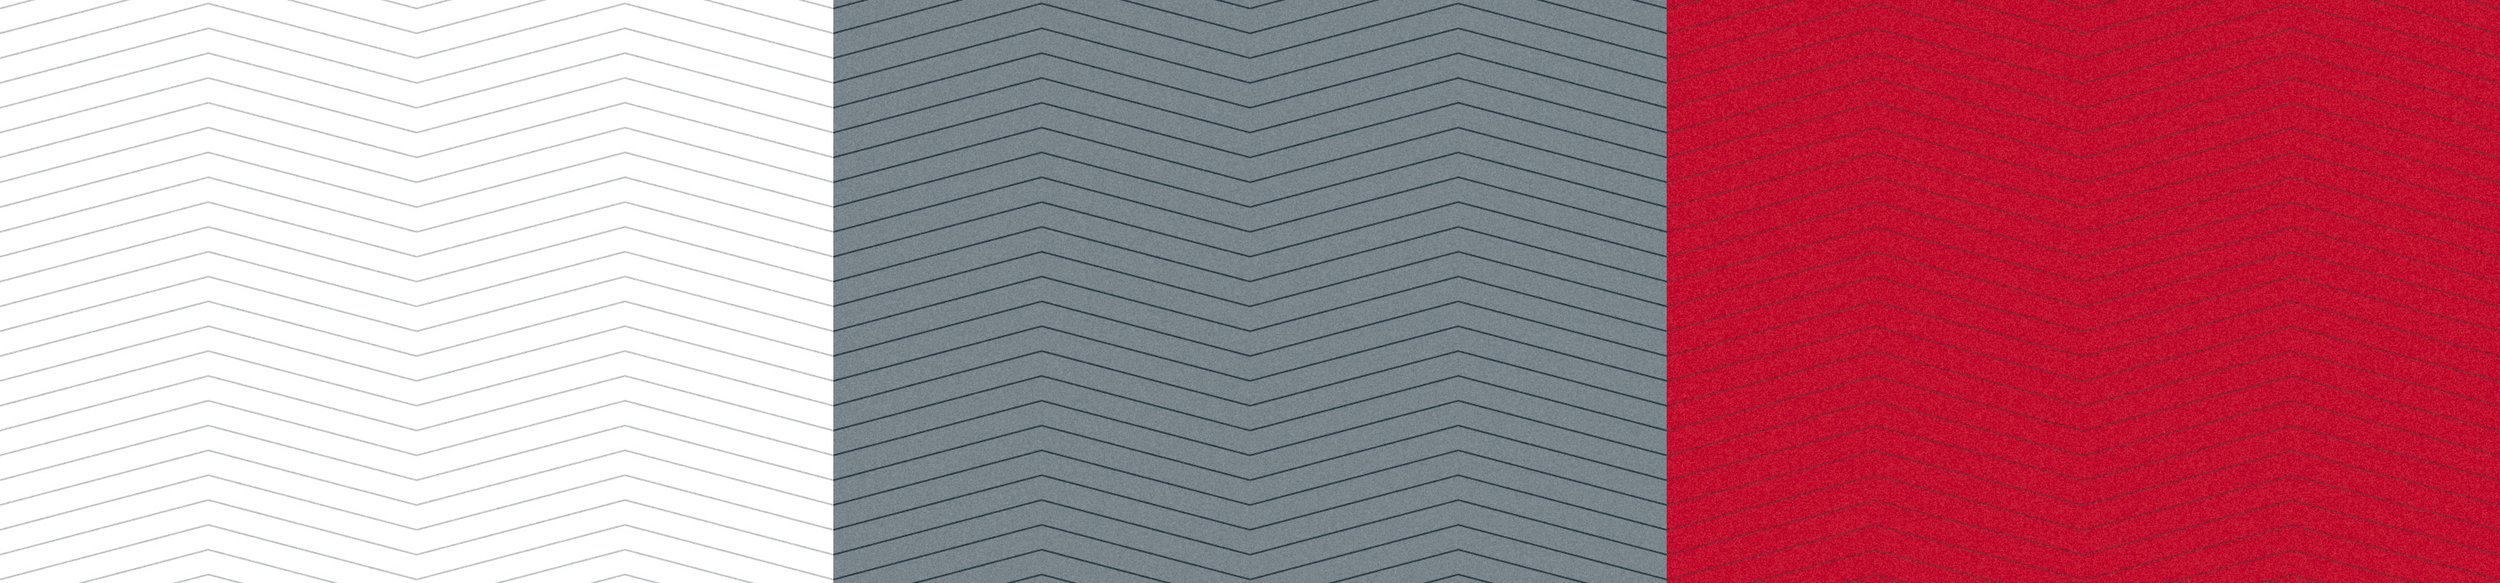 ronaldvillegas-big12-pattern.jpg